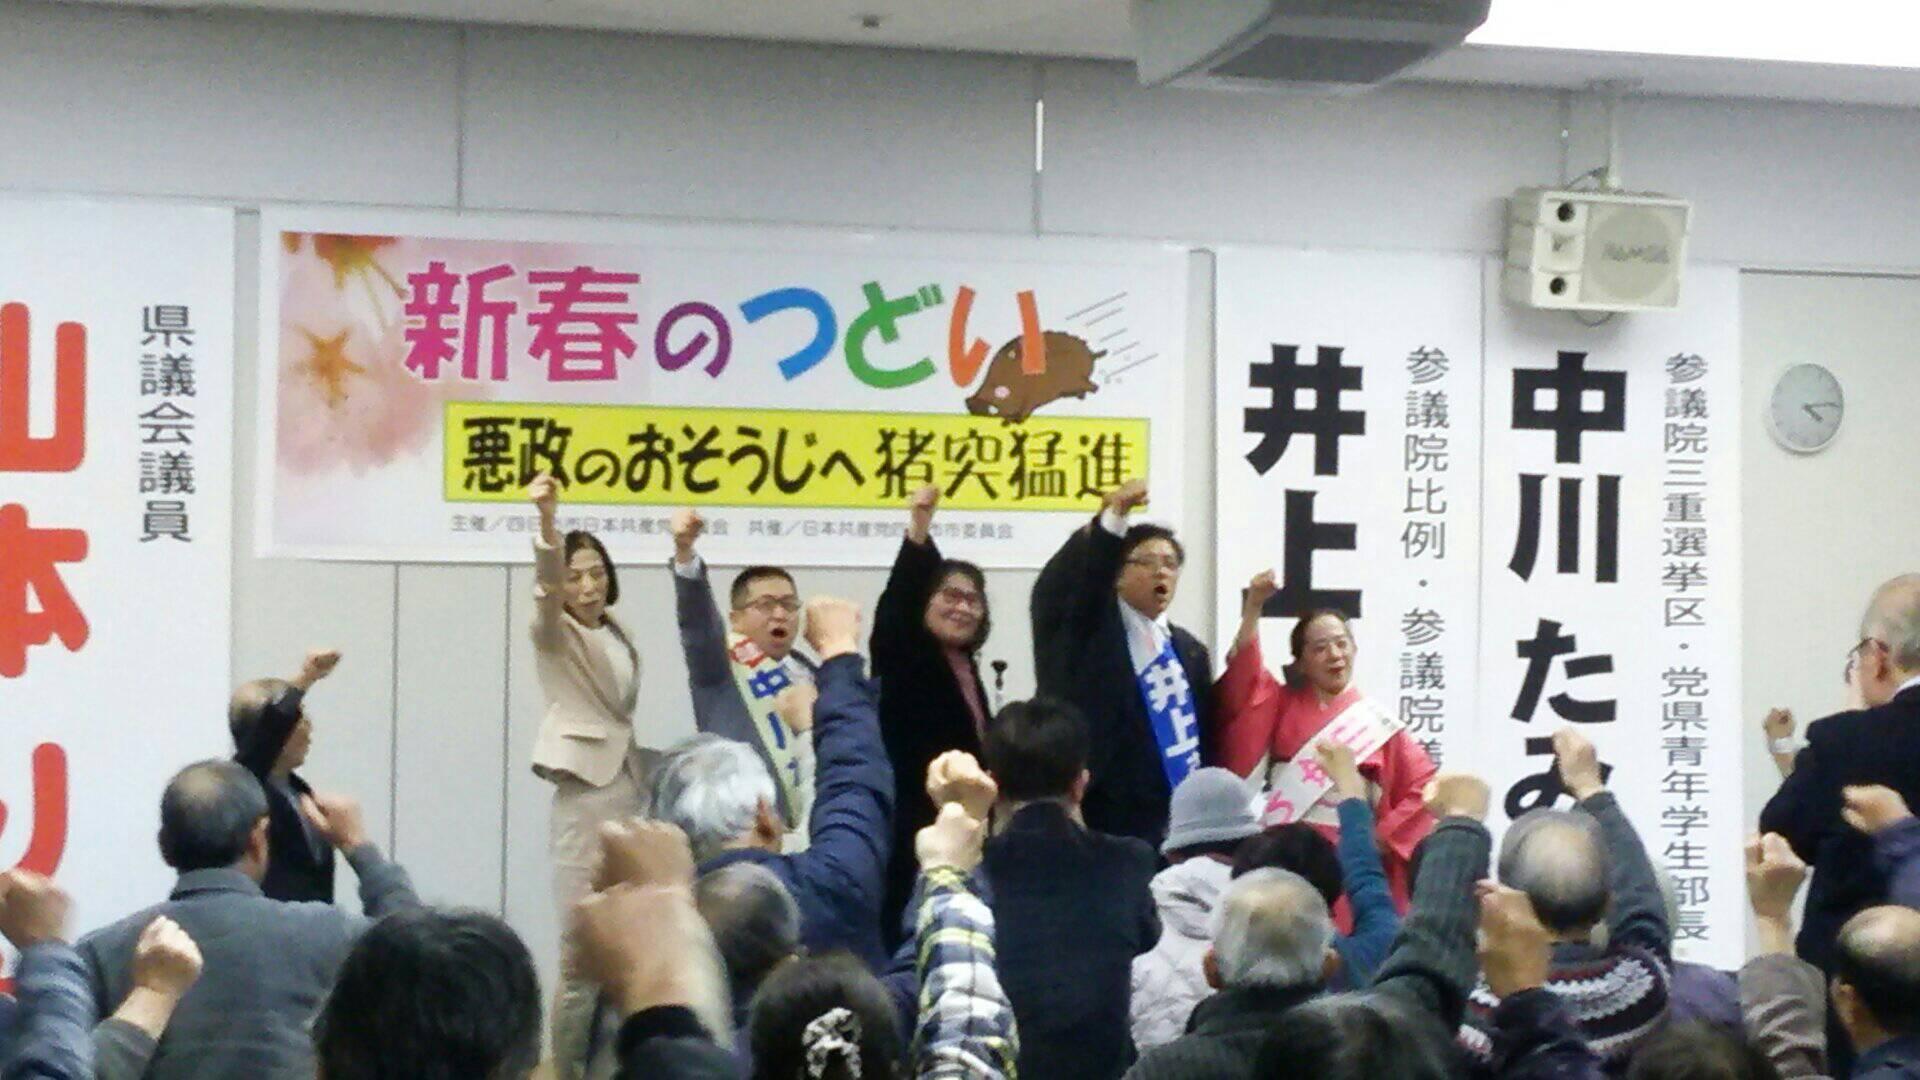 http://www.inoue-satoshi.com/diary/19%E5%9B%9B%E6%97%A5%E5%B8%82.jpg